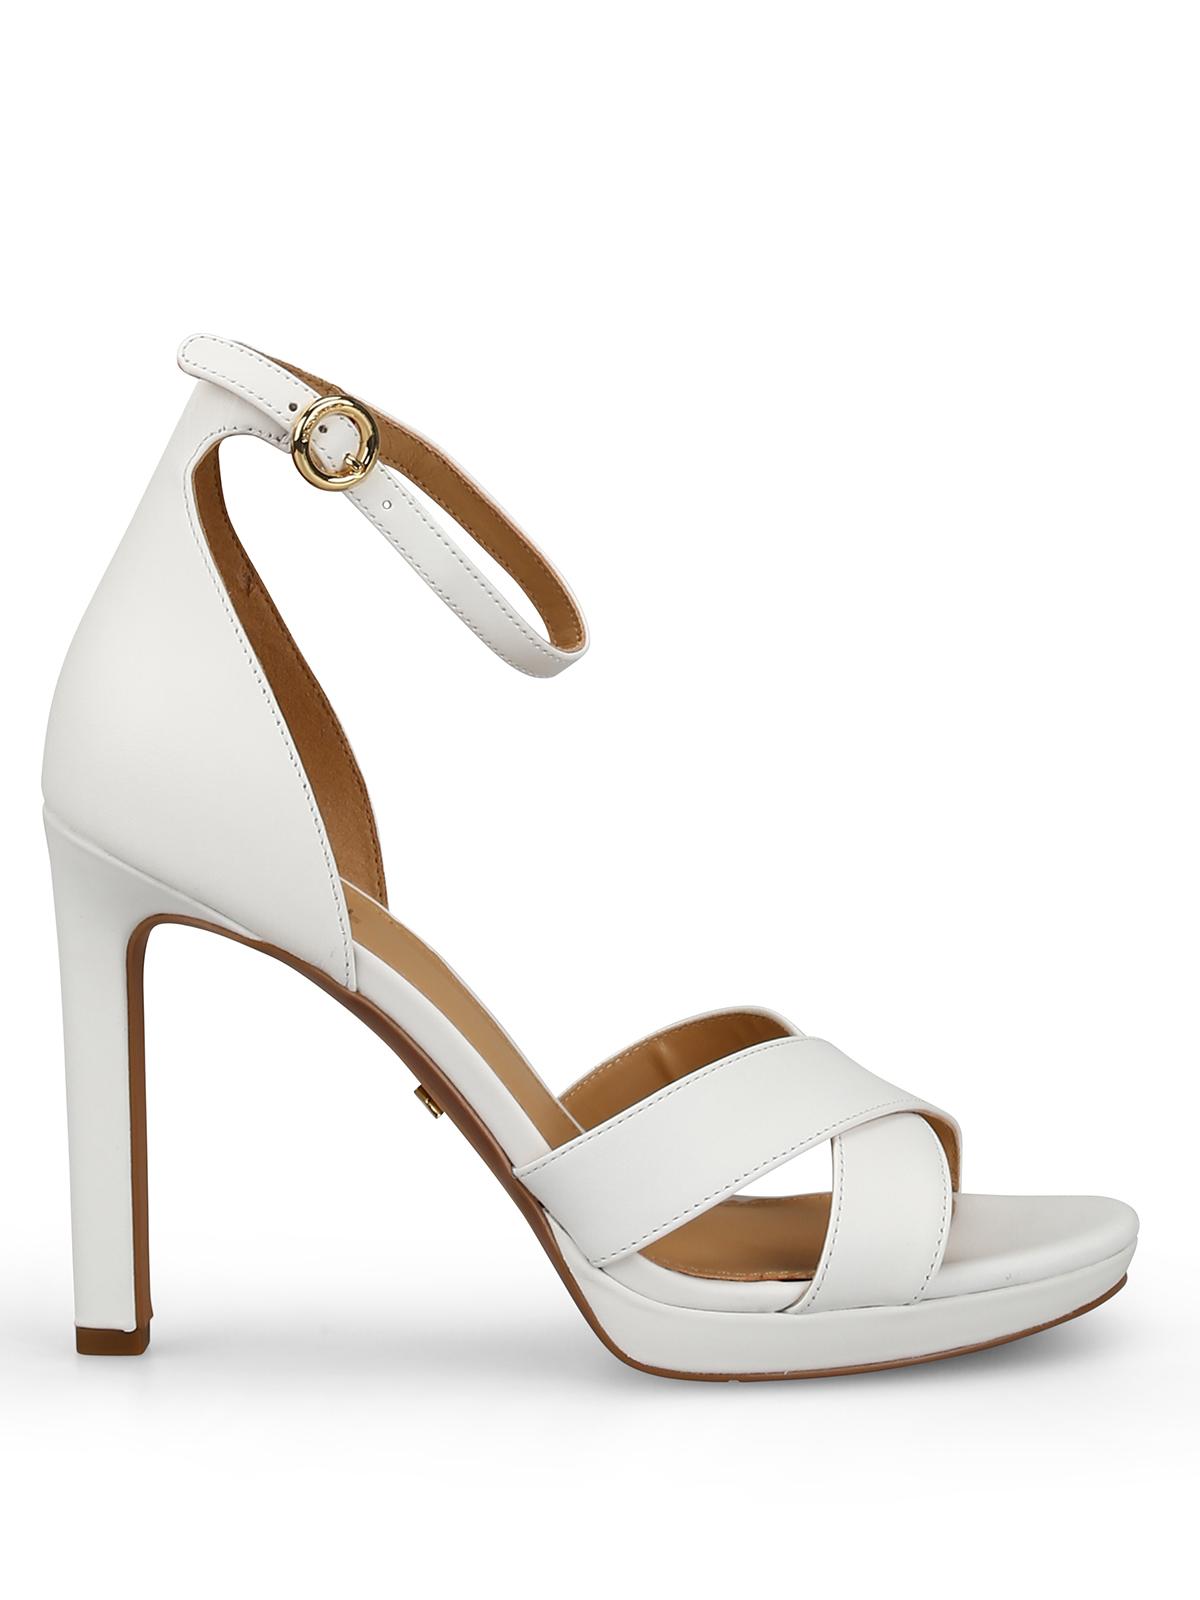 6597aaaf3d5a Michael Kors - Alexia white sandals - sandals - 40S9AXHA1L 085 ...